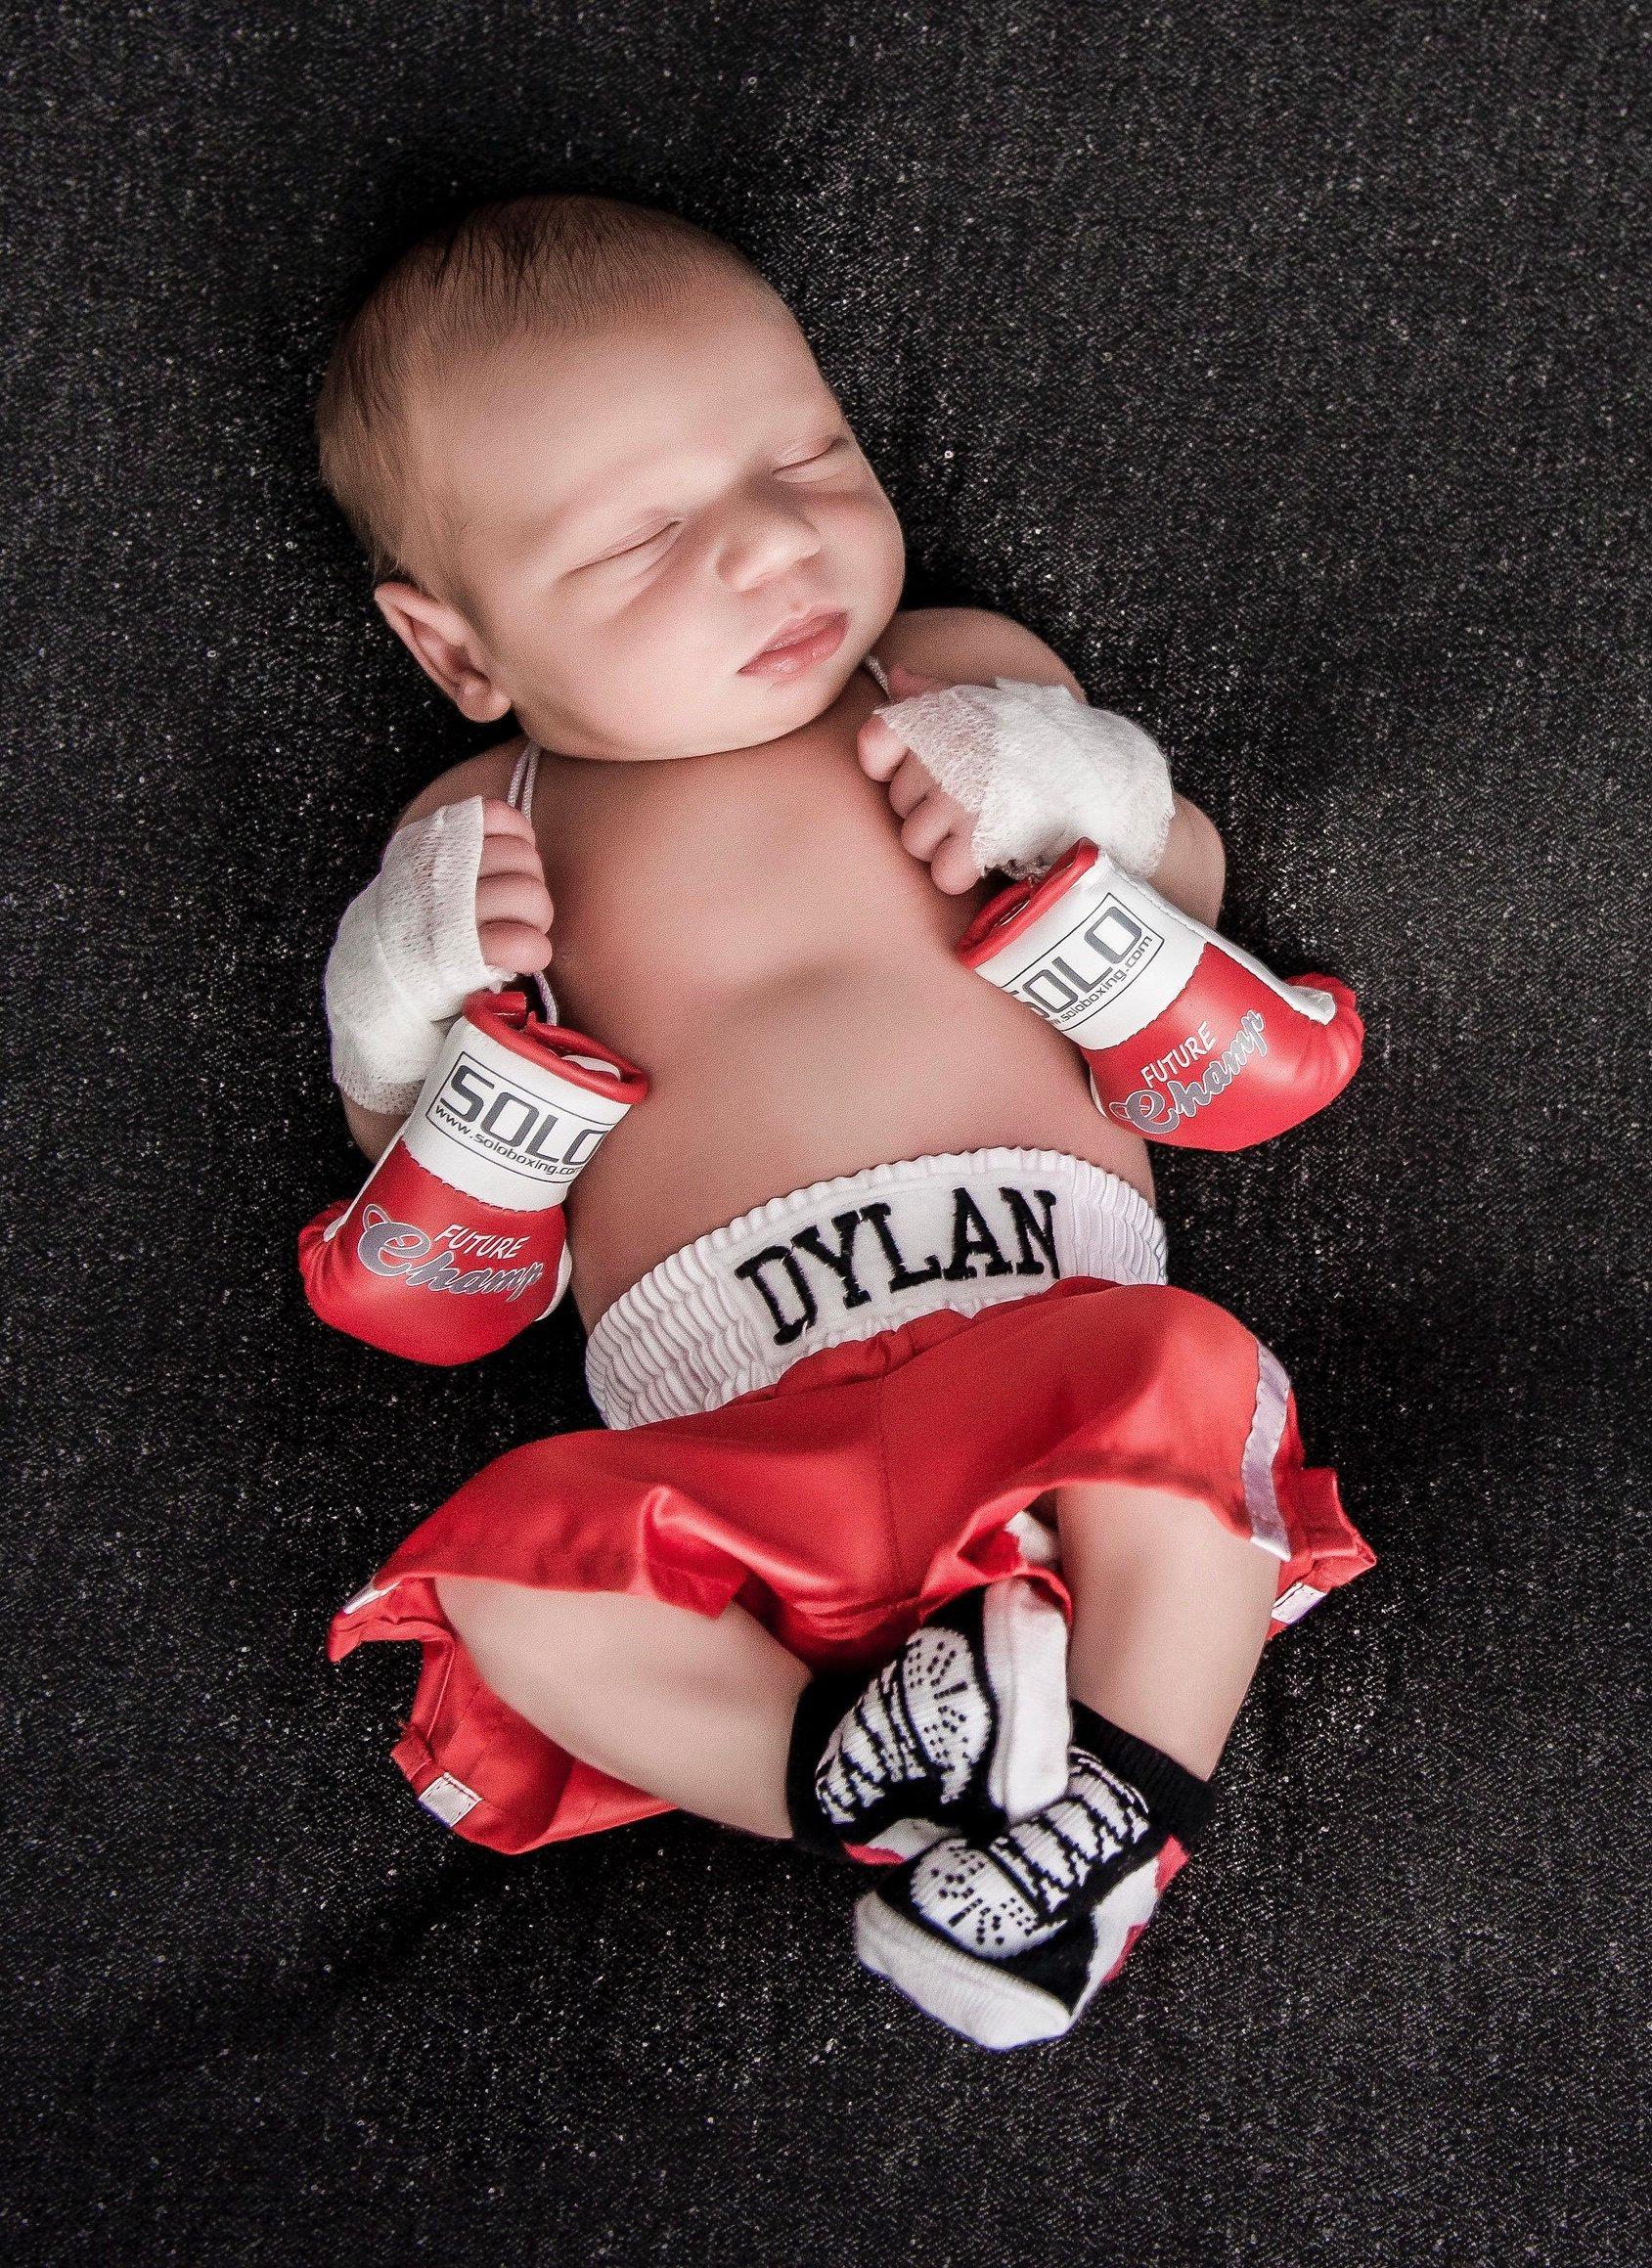 FRANCE FRENCH FLAG Mini Boxing Gloves *NEW*